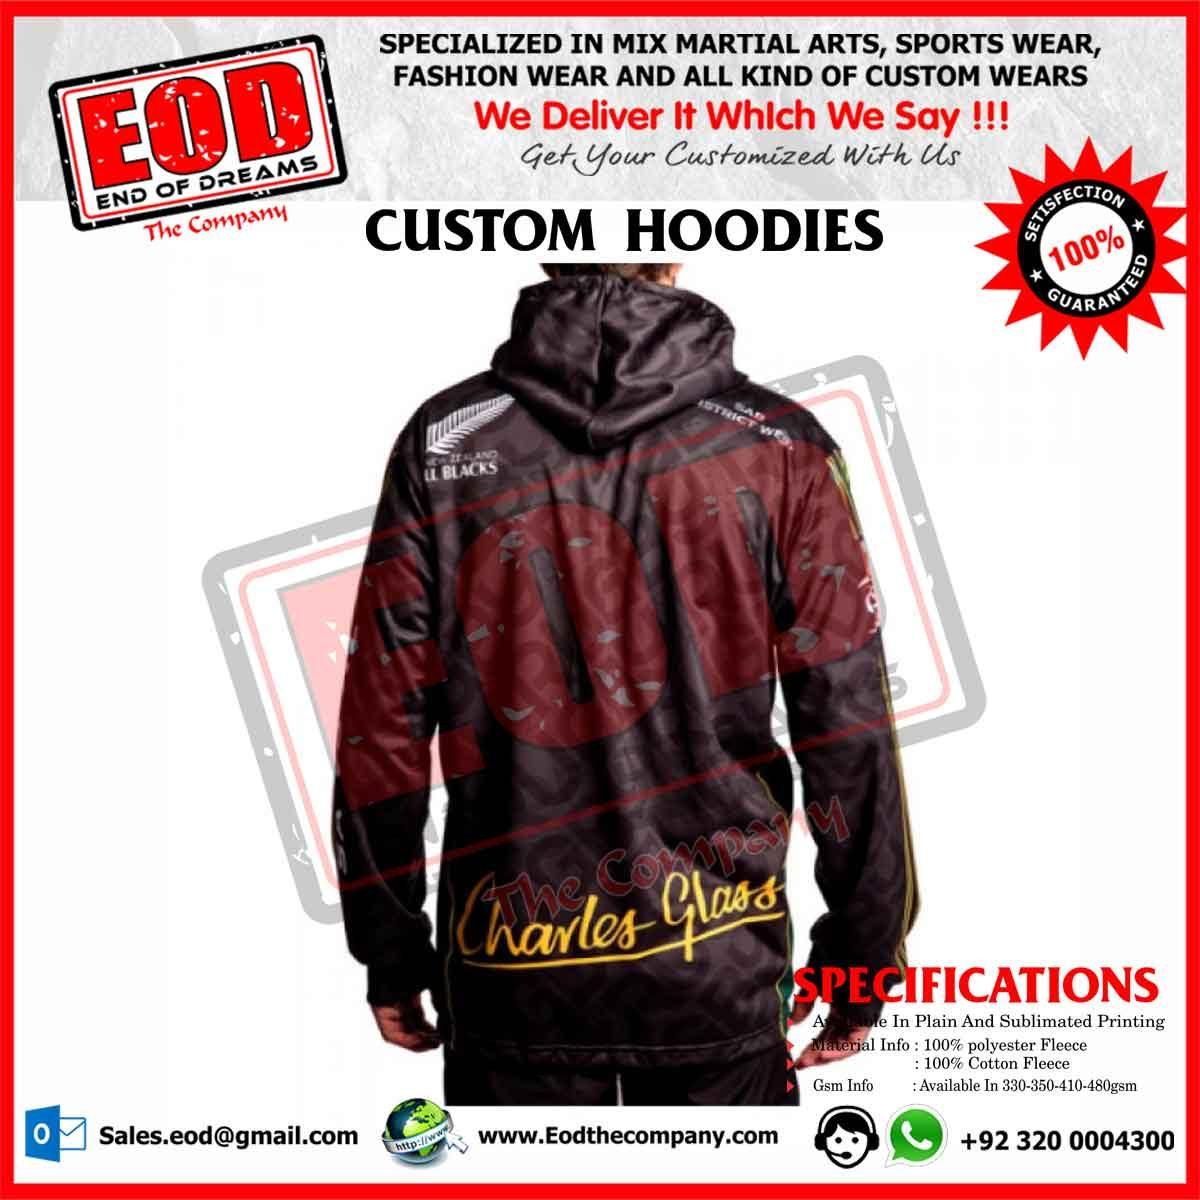 Custom Hoodies - EOD The Company